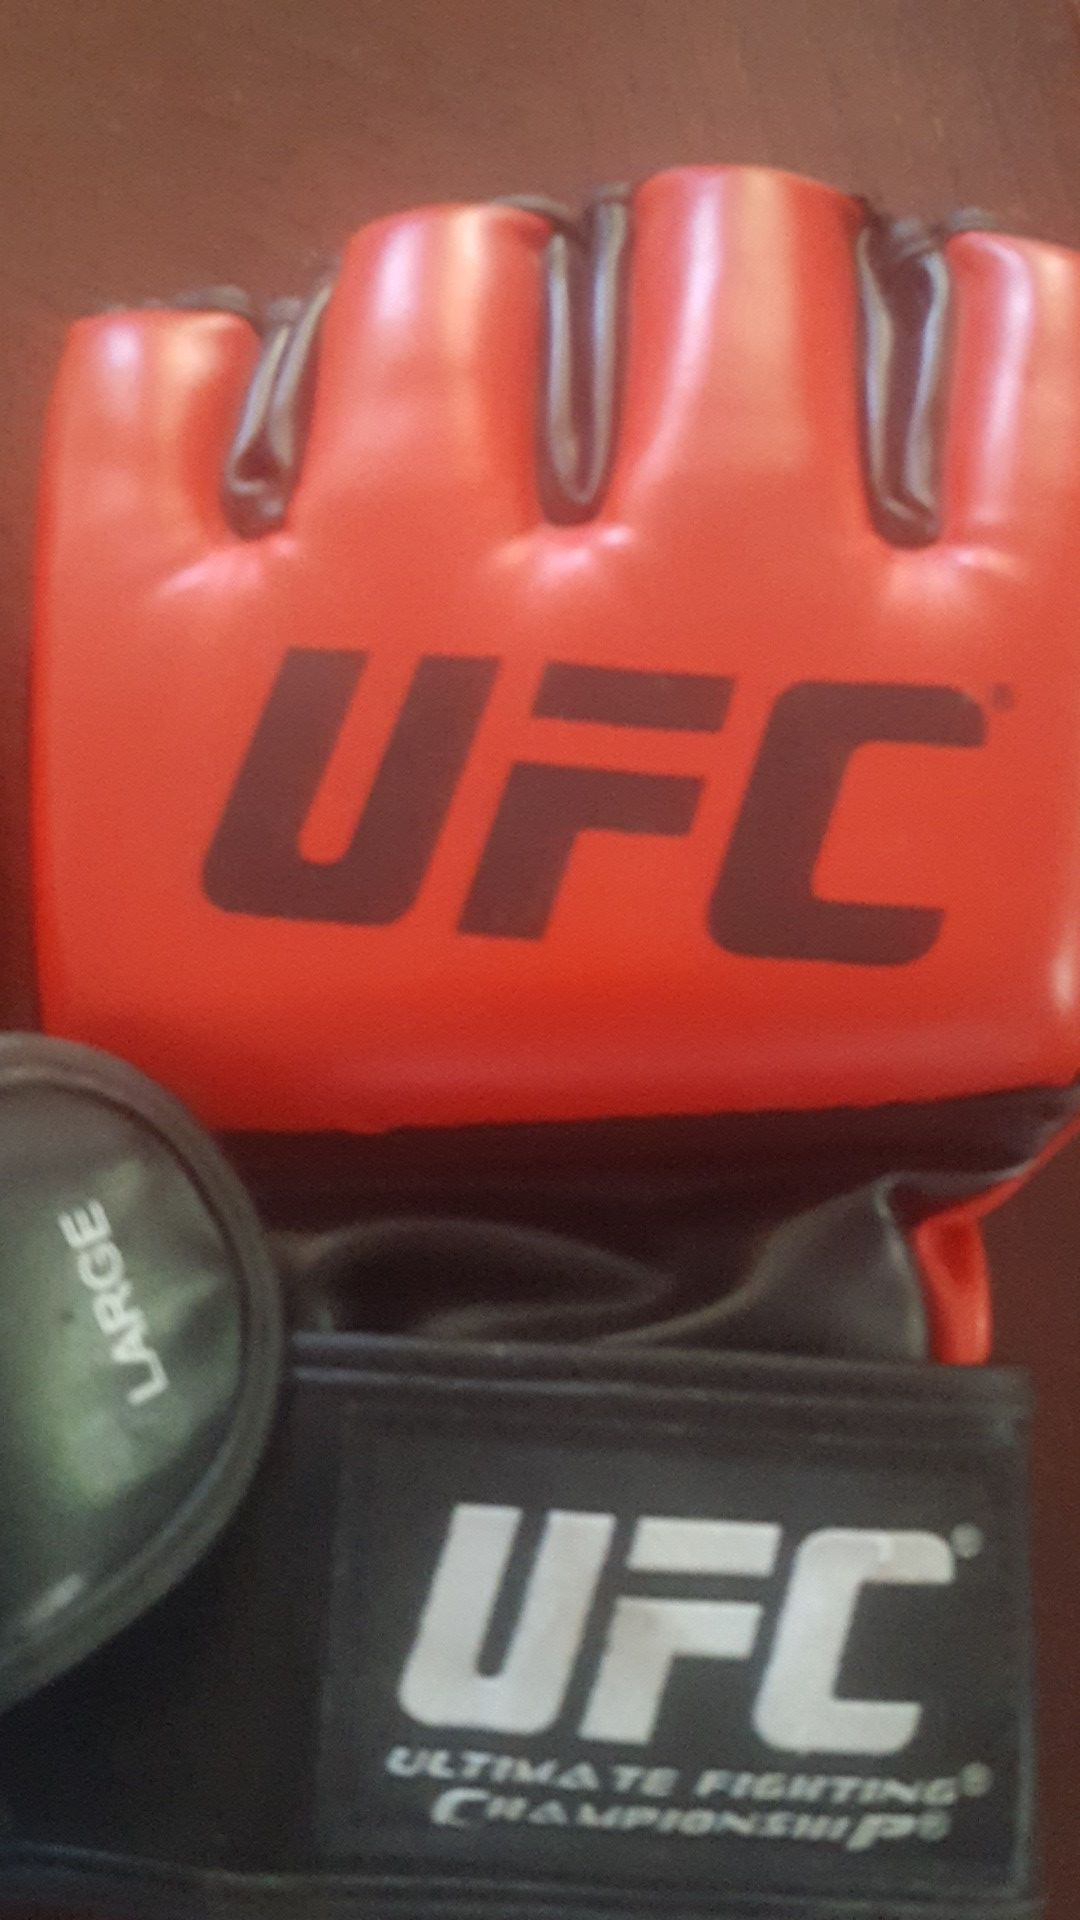 UFC SET LARGE FIGHTING GLOVES